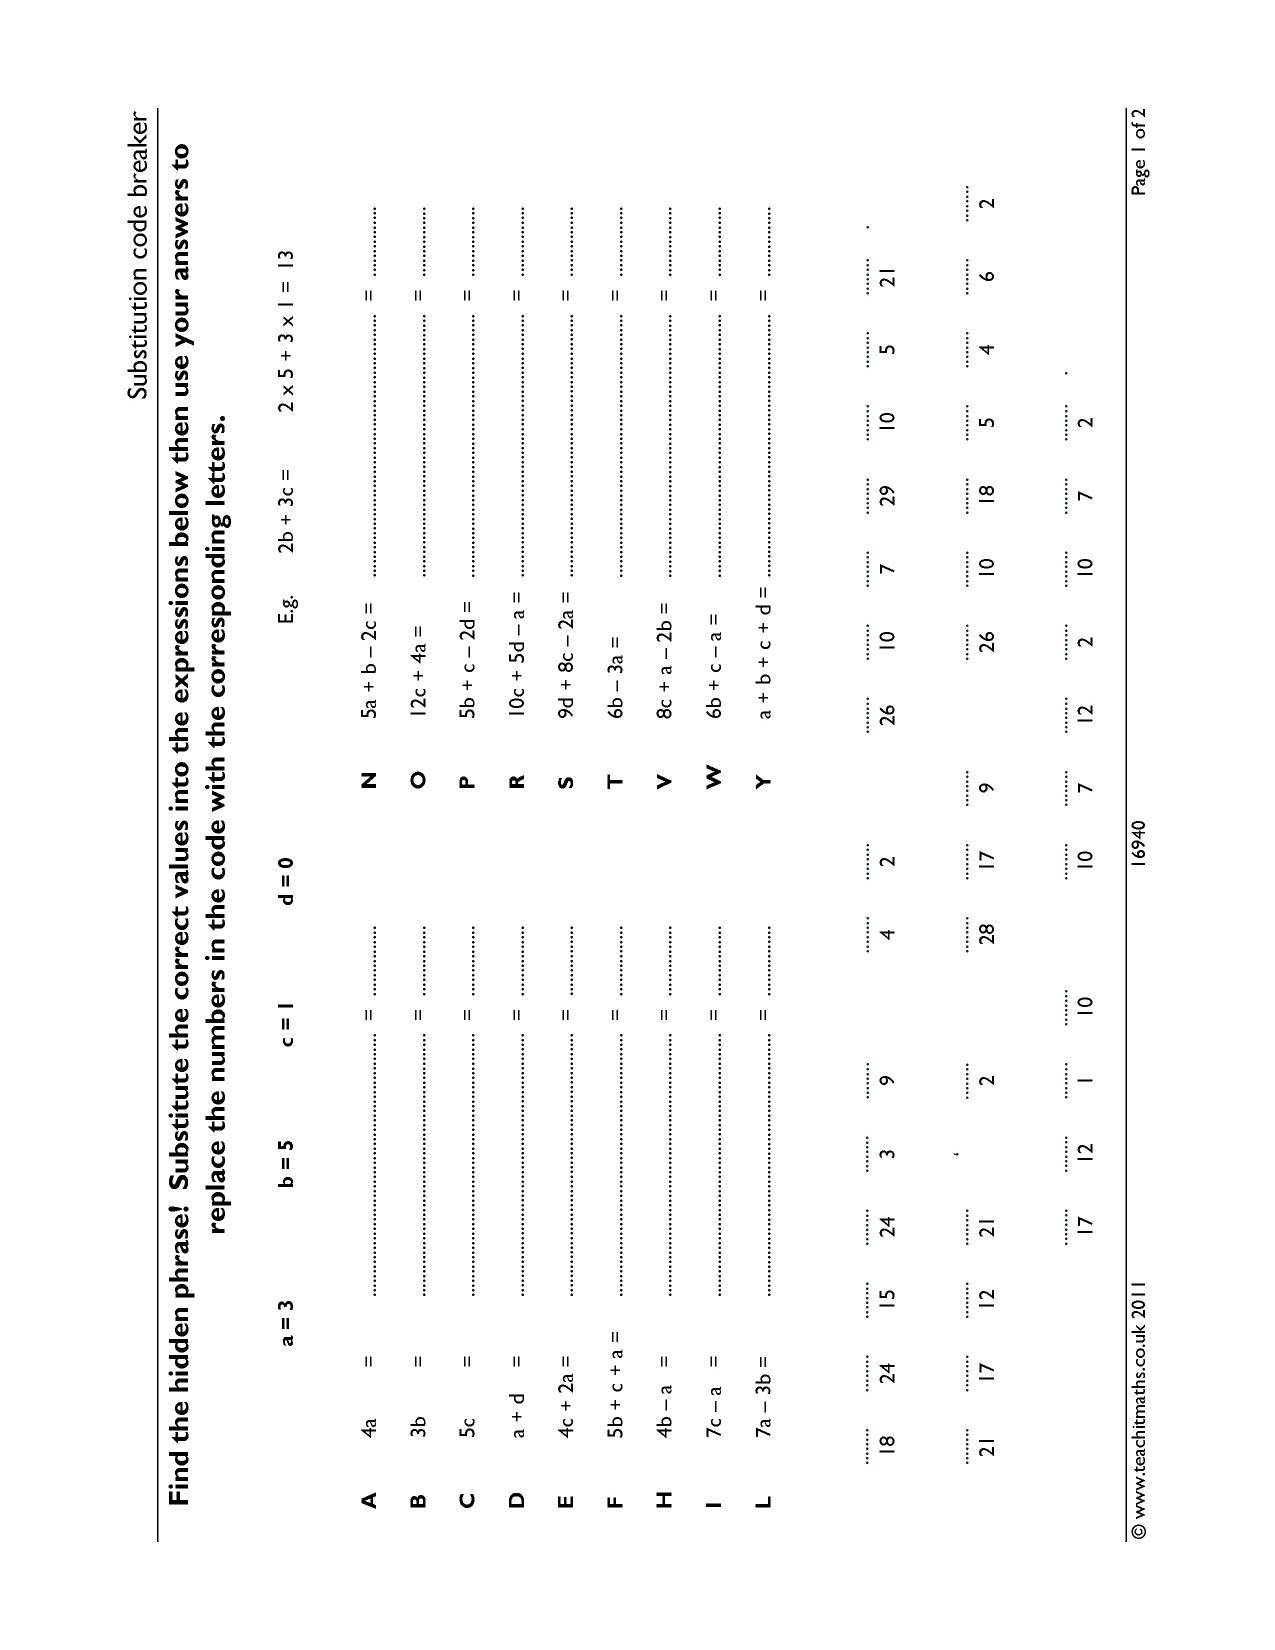 Crack The Code Math Worksheet